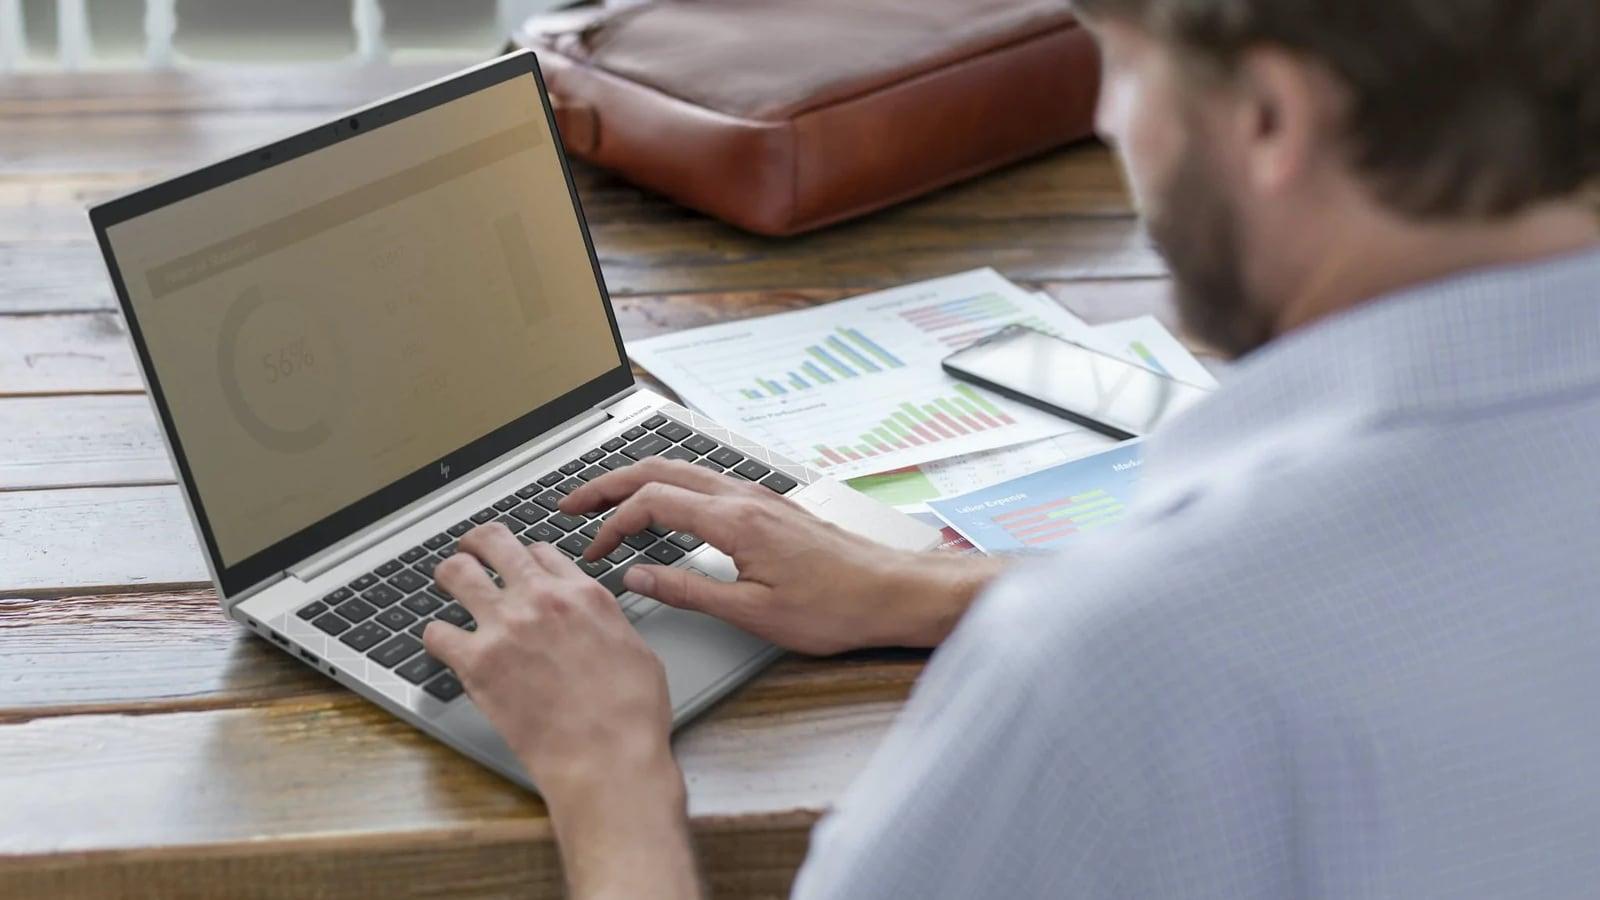 HP EliteBook 805 G7 Series Multitasking Laptops